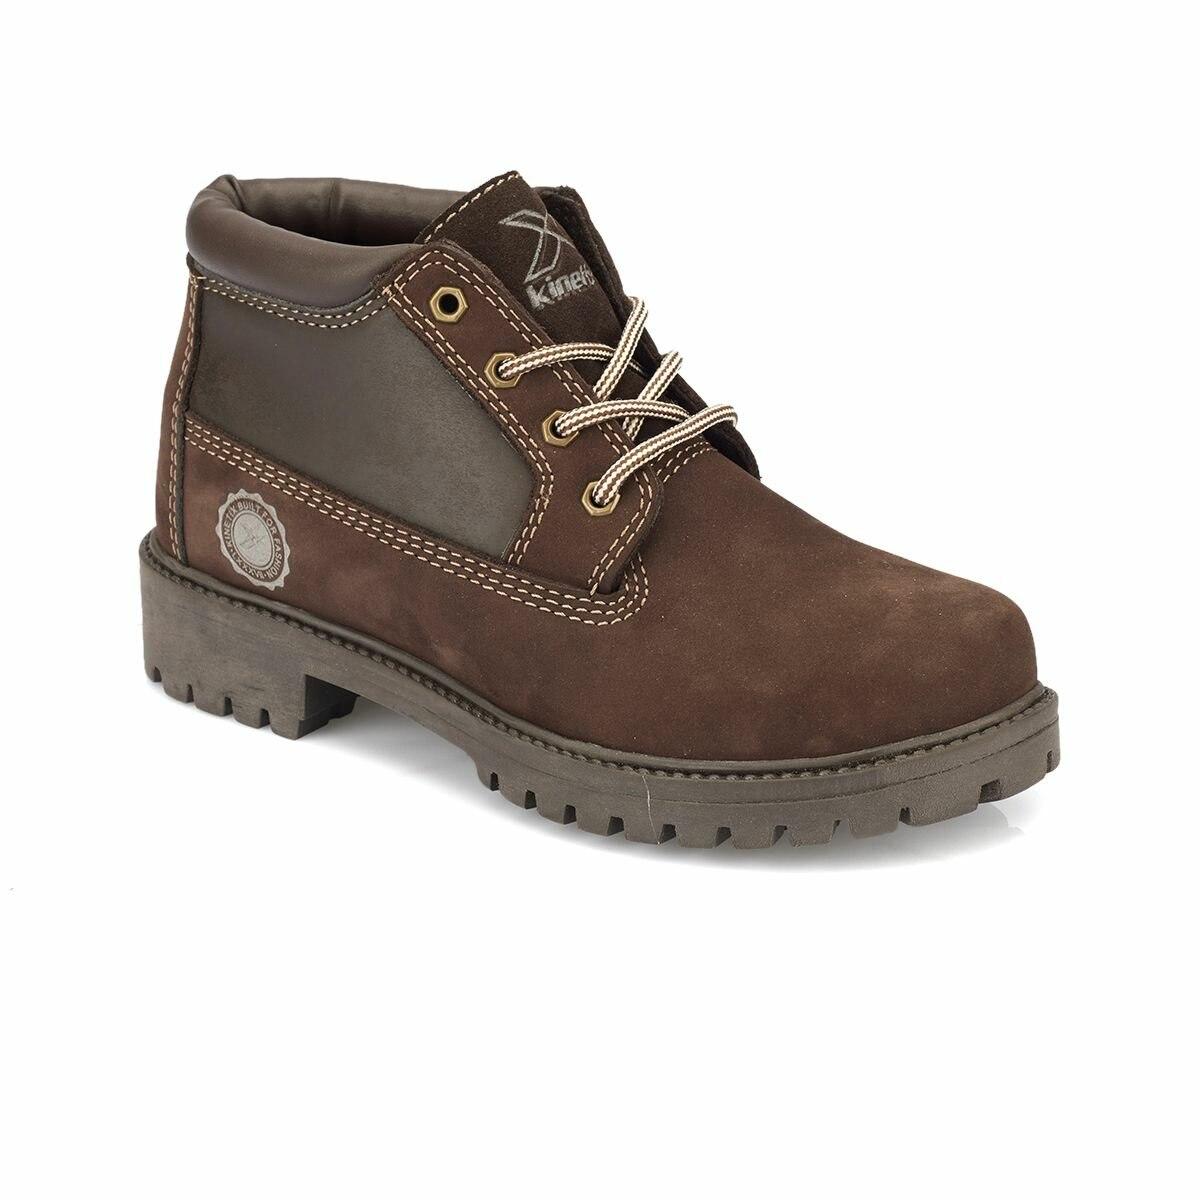 FLO NEDY Brown Women 'S Boots KINETIX